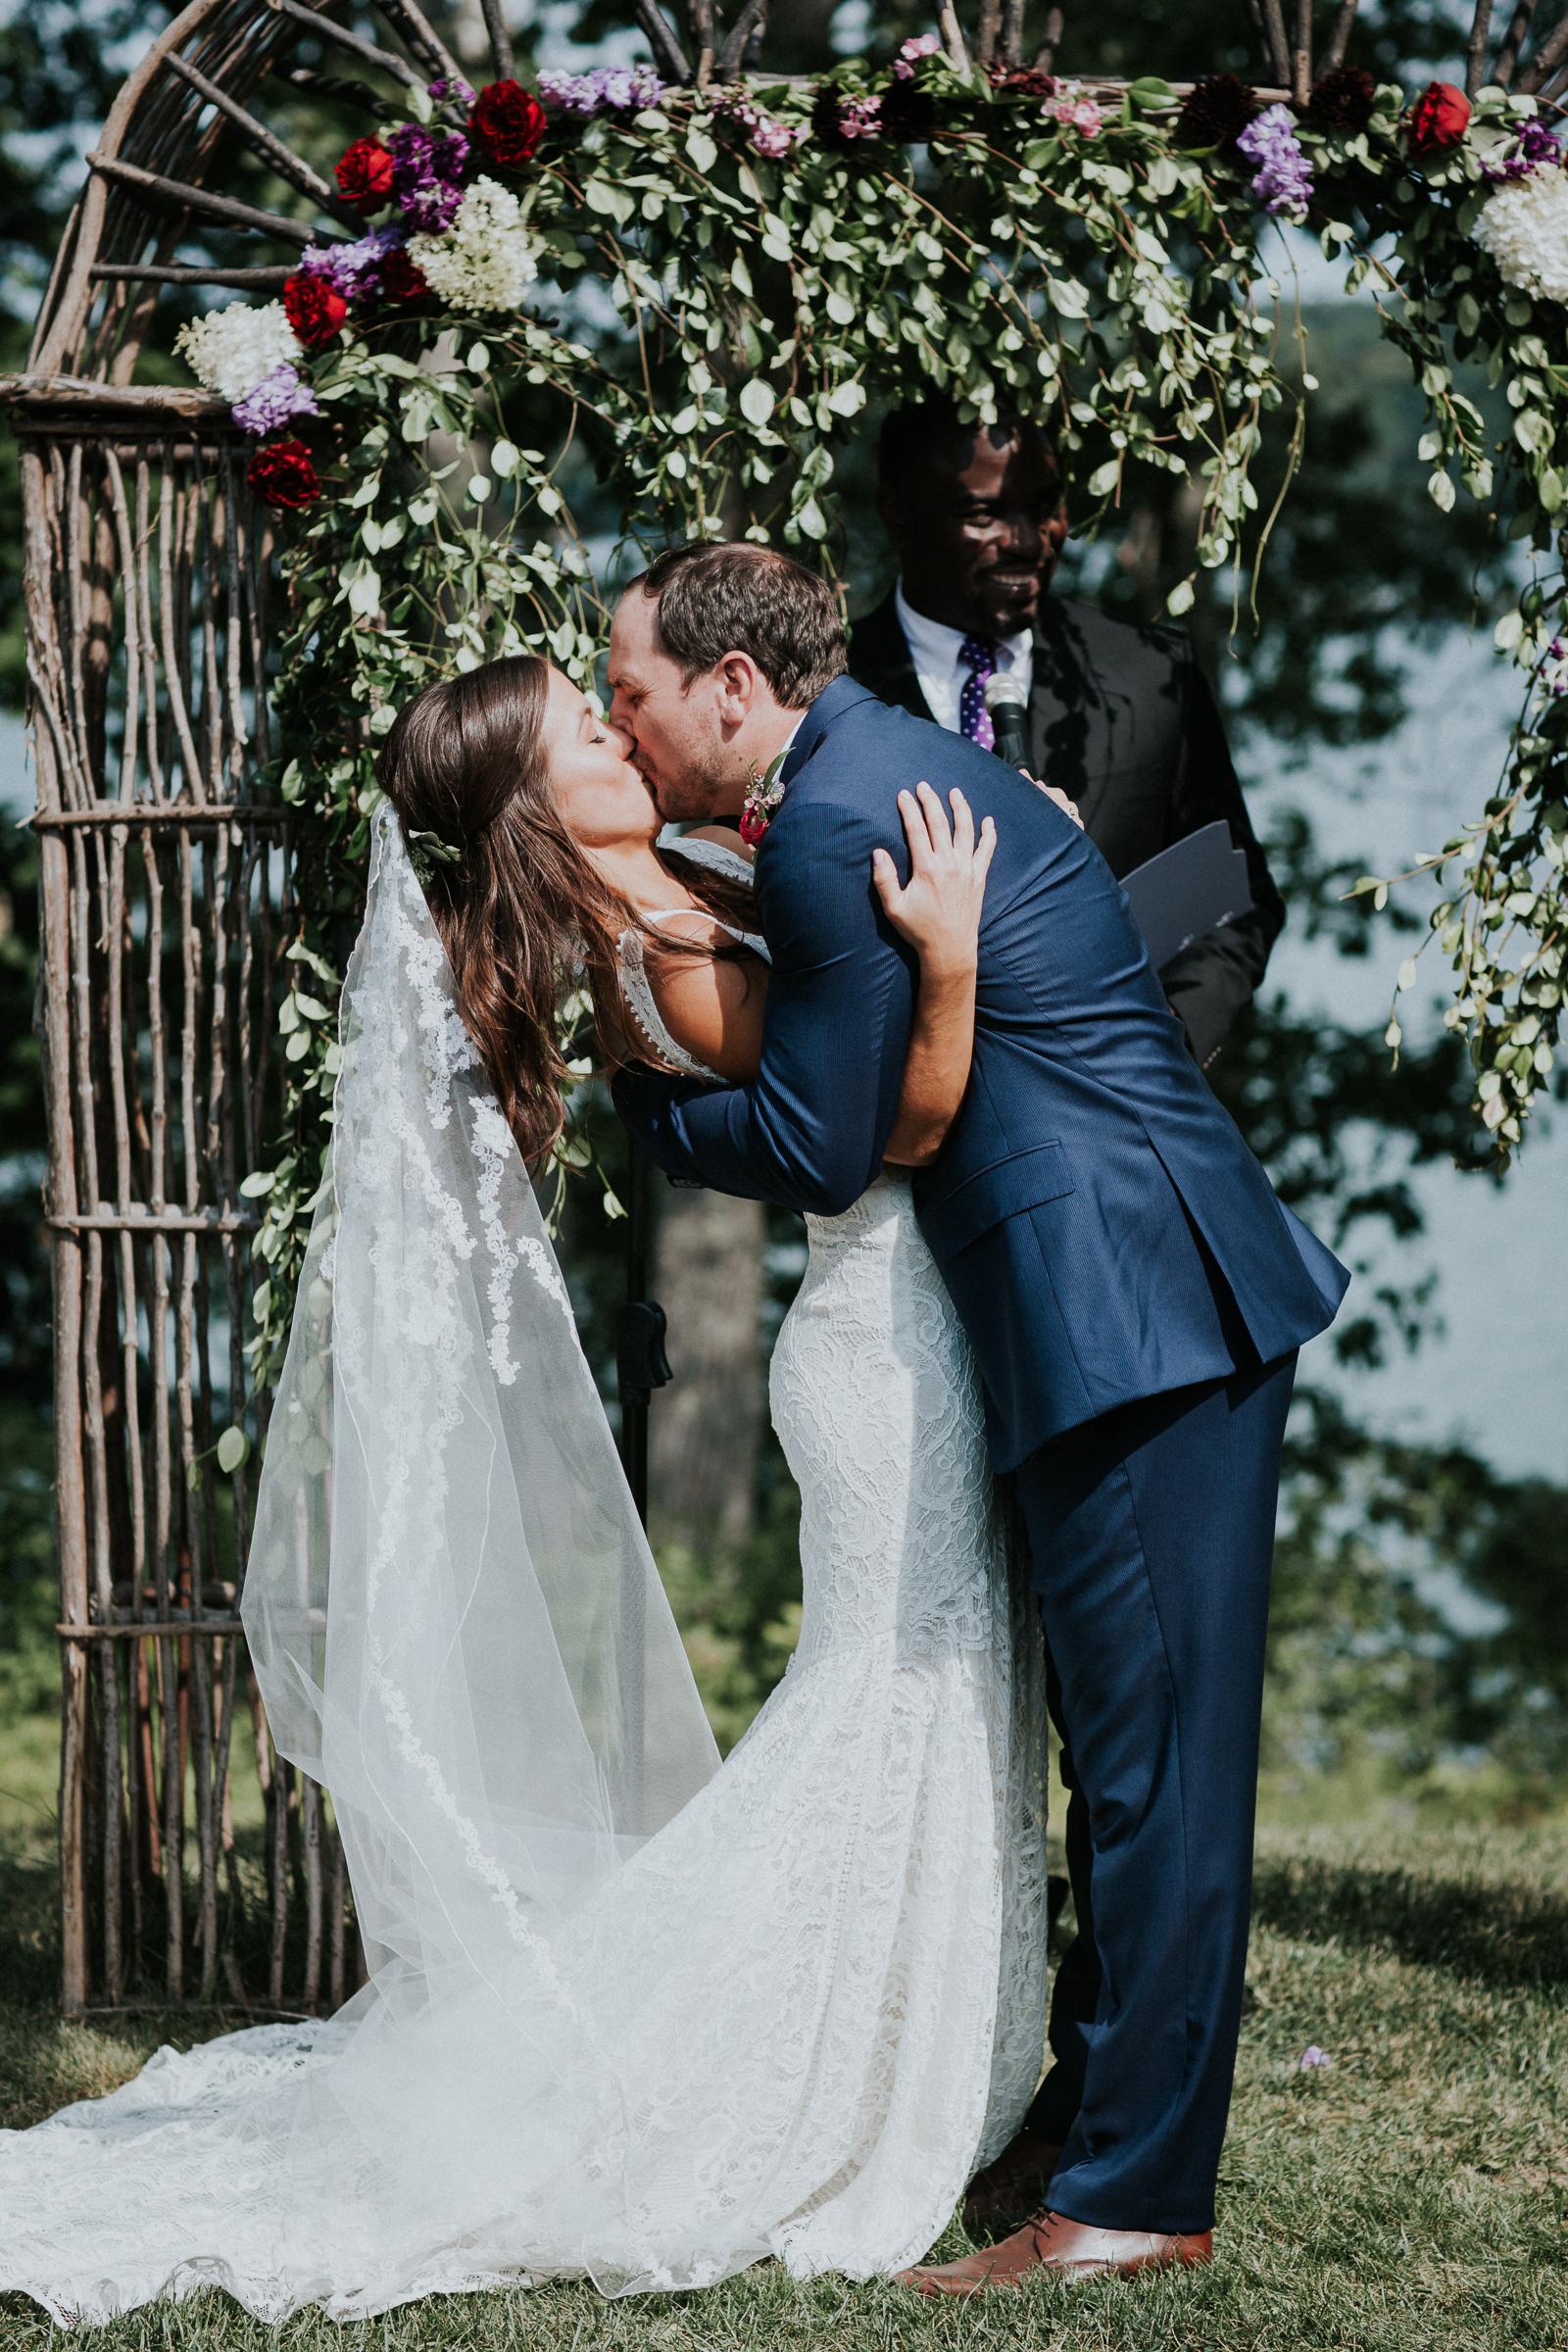 Marianmade-Farm-Wiscasset-Maine-Fine-Art-Documentary-Wedding-Photographer-Elvira-Kalviste-Photography-84.jpg